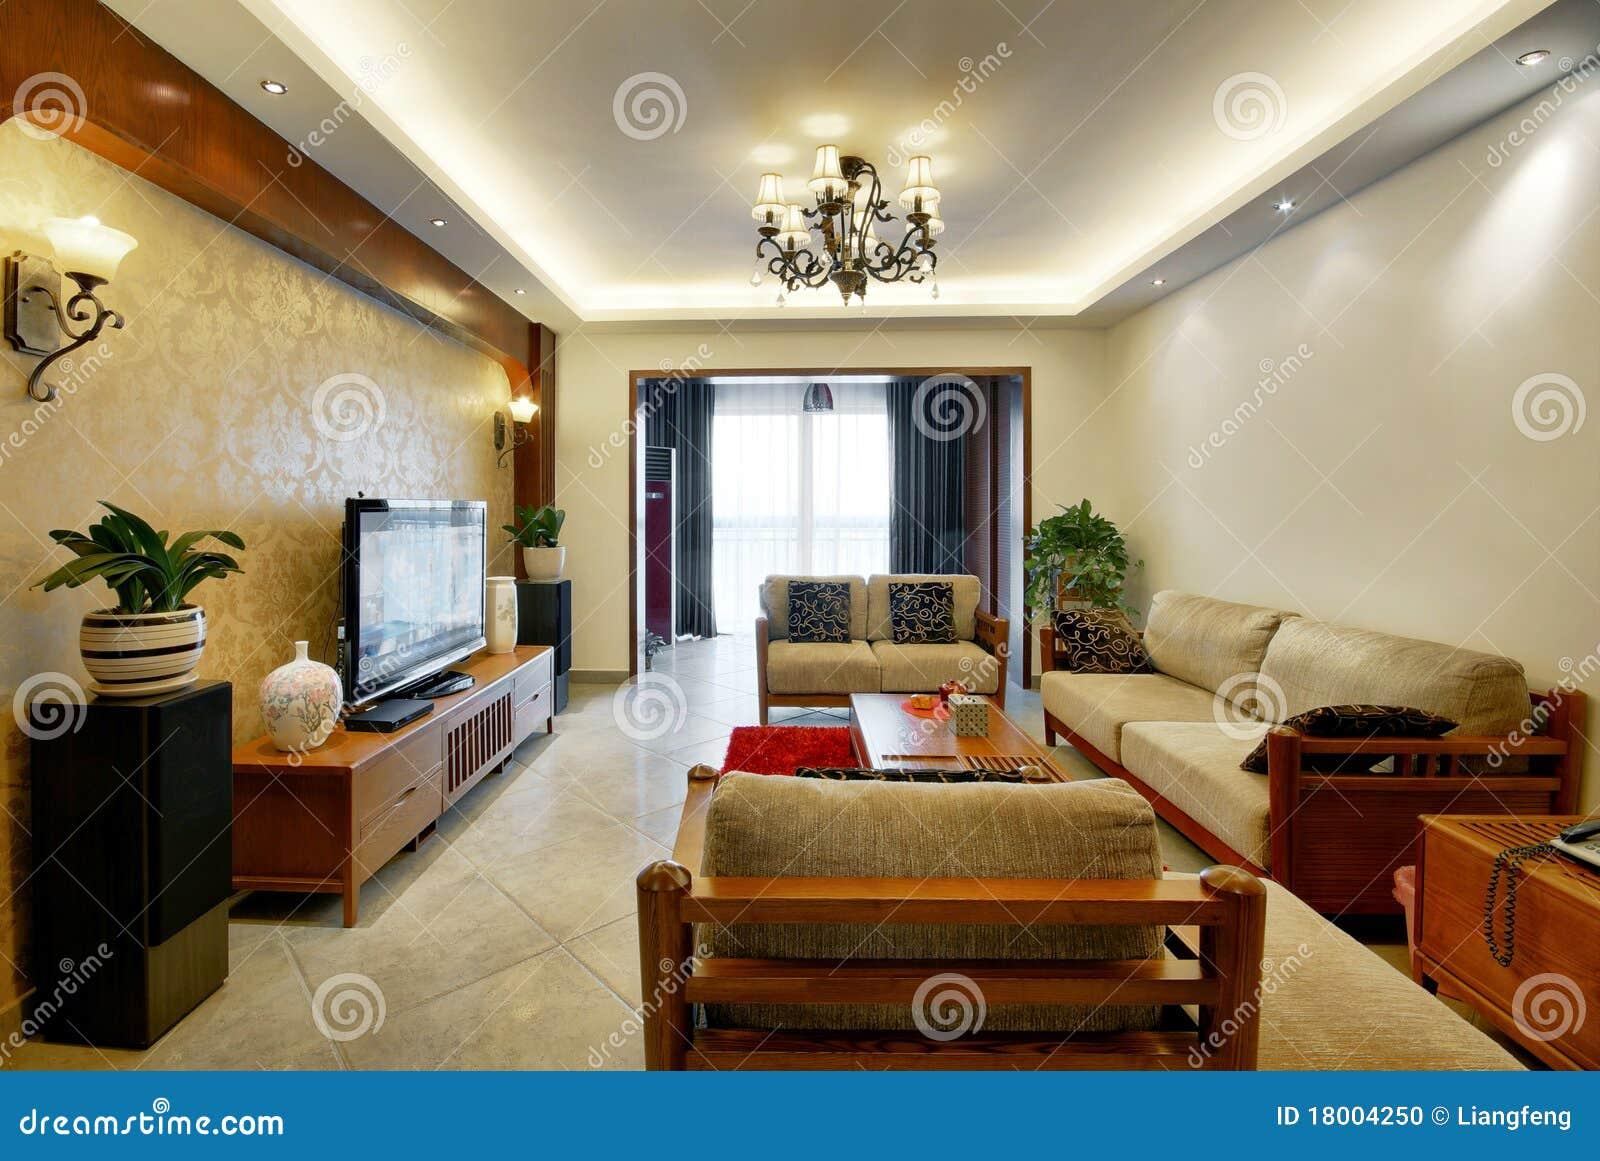 Living Room Beautiful Home Decor beautiful home decor stock photo image 18004320 photo